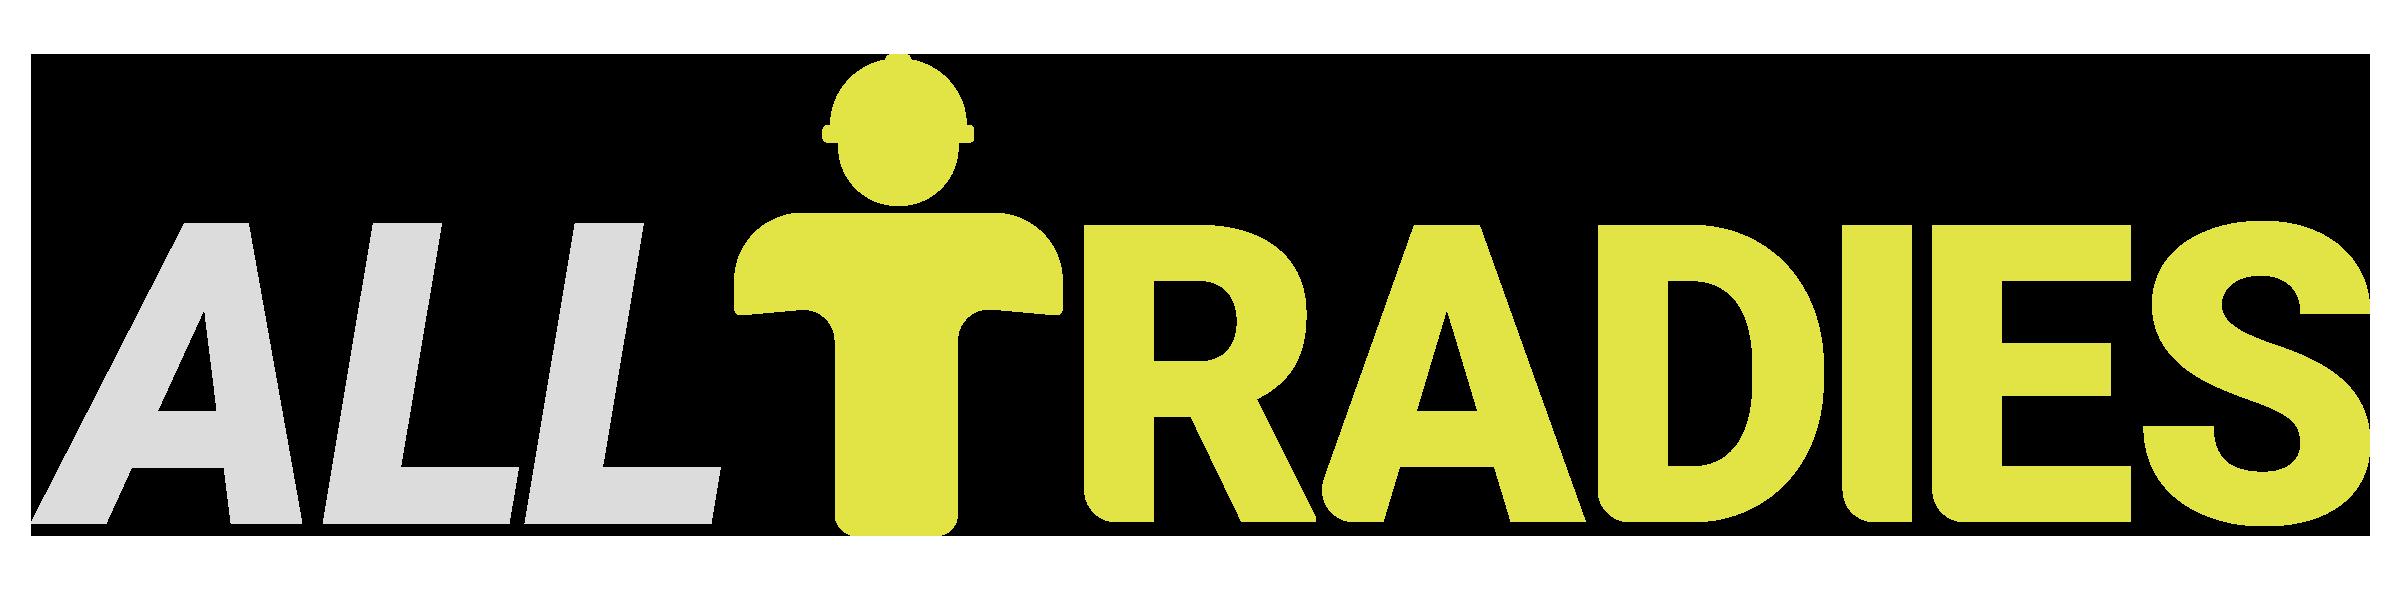 All Tradies